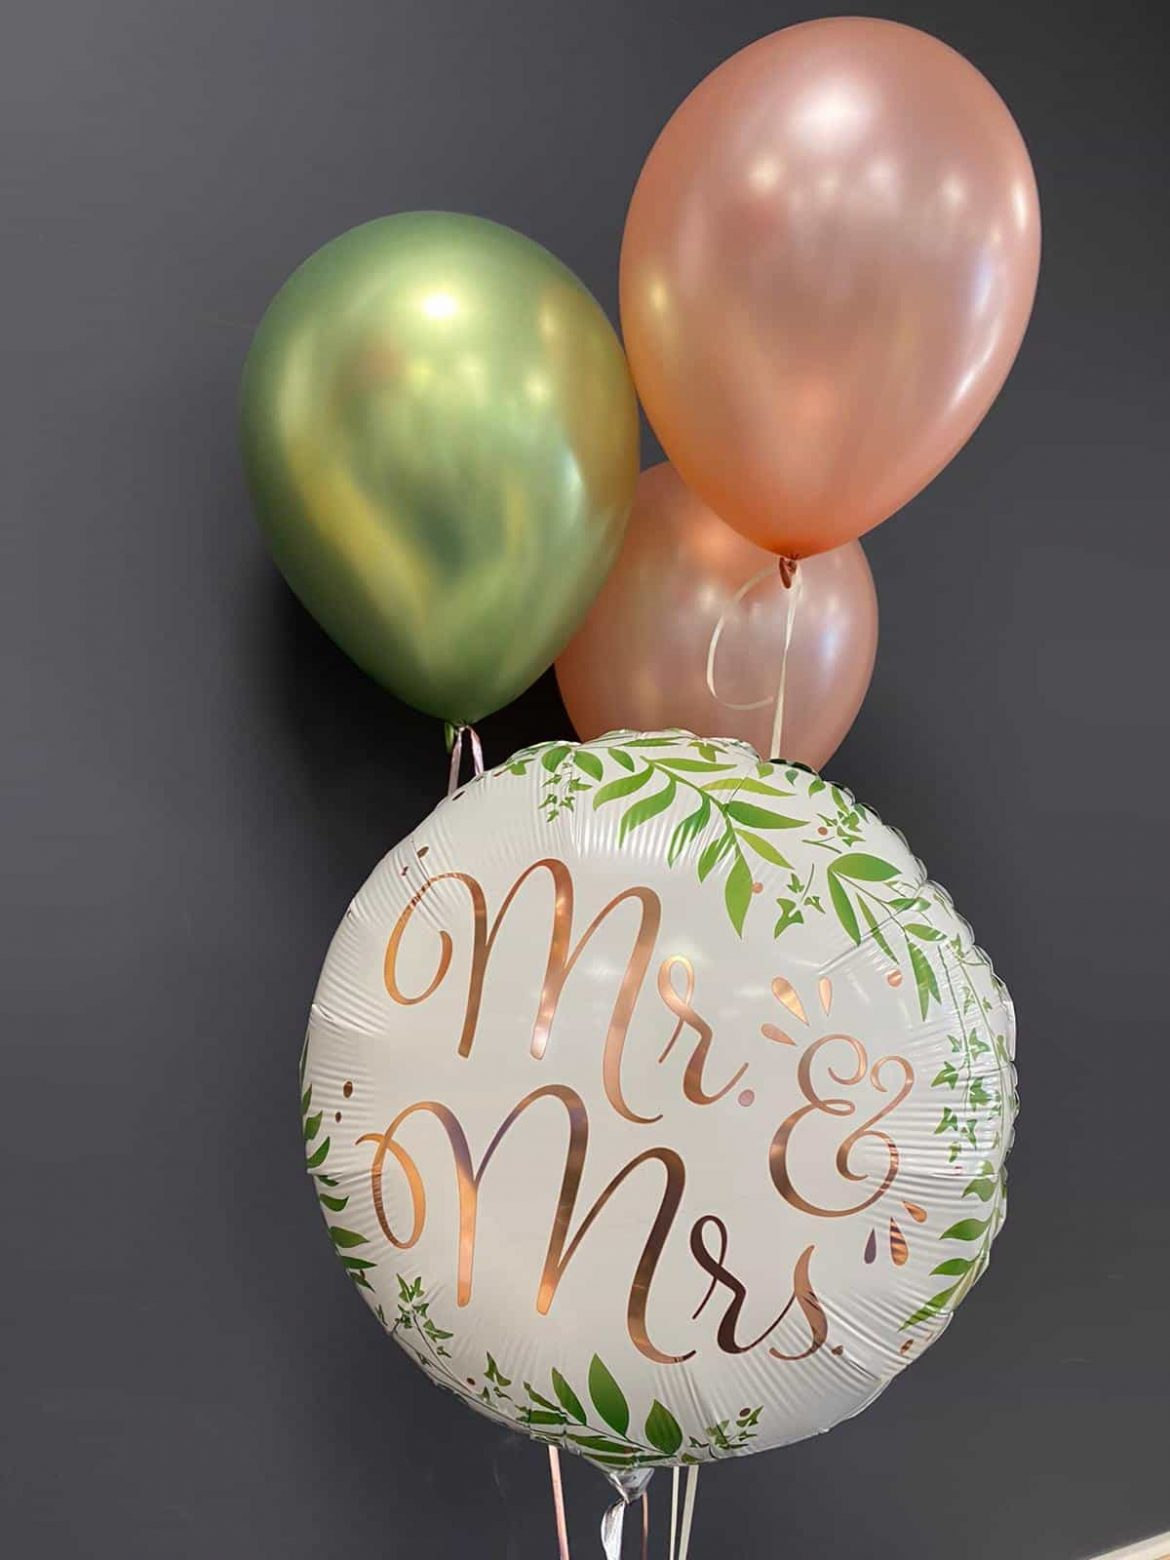 Hochzeitsballons<br>Mr & Mrs Ballon weiß € 5,50<br> Latexballons grün und rosa 1